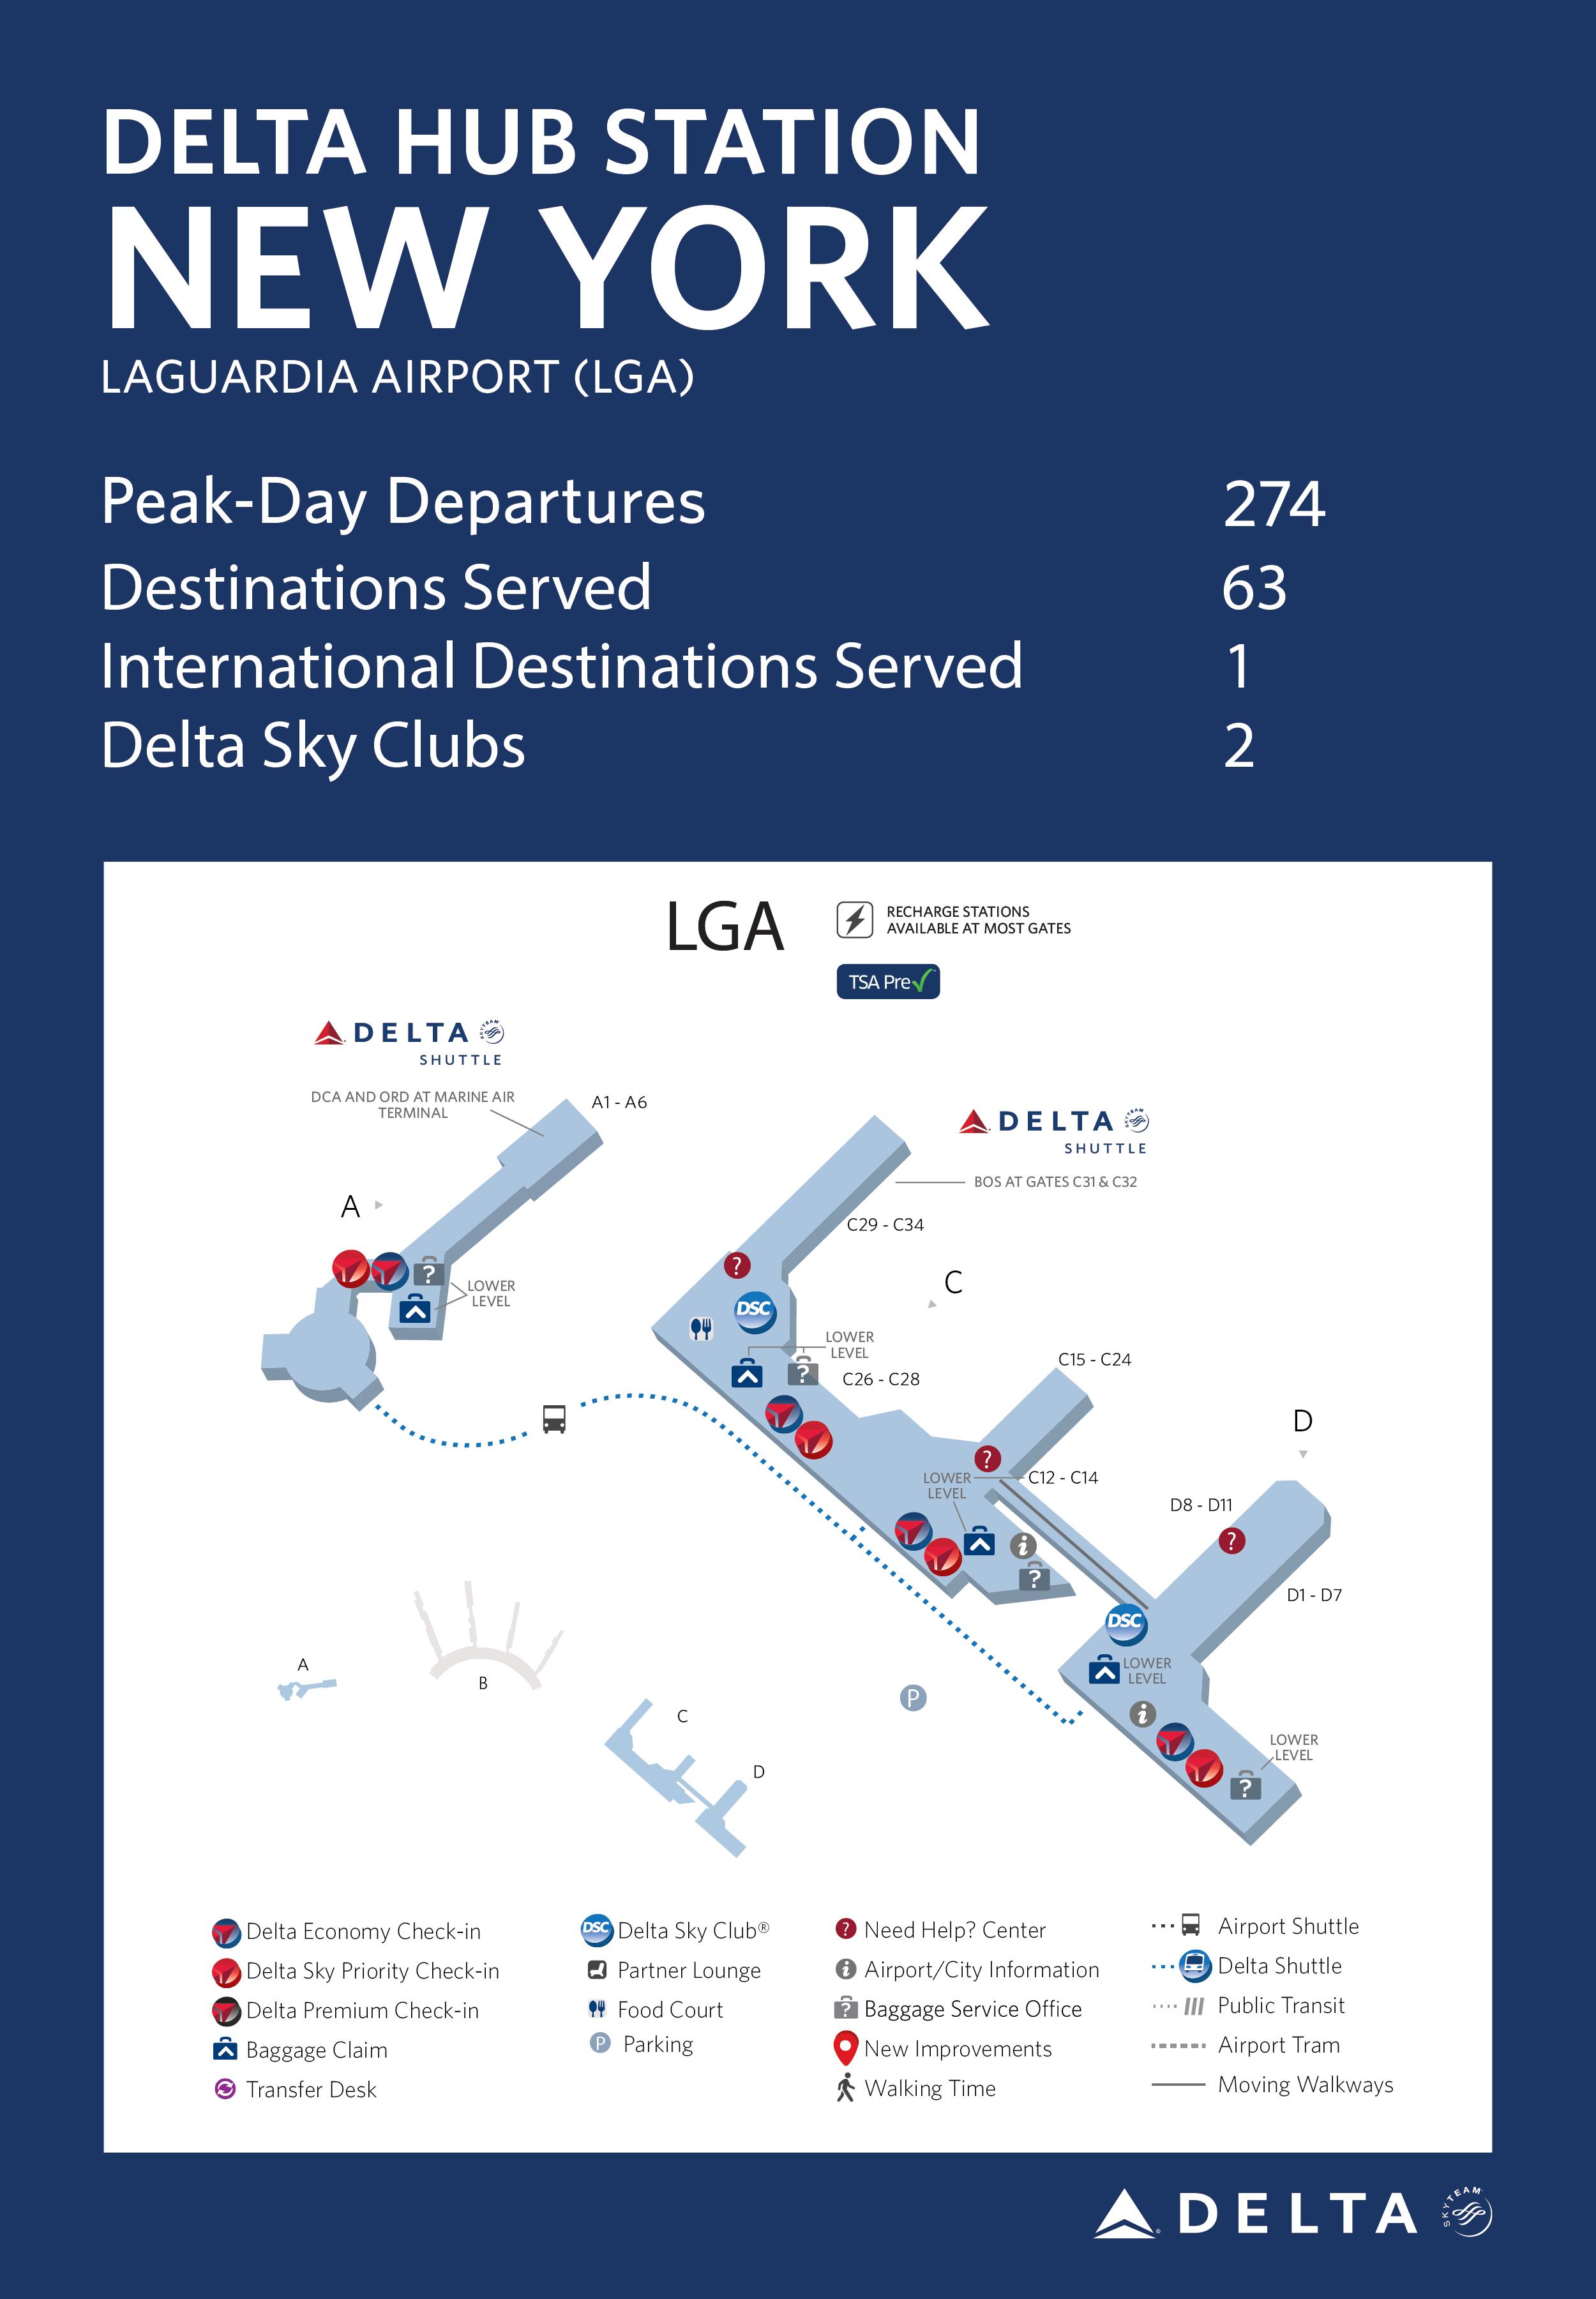 New York (LGA) Hub Station Fact Sheet